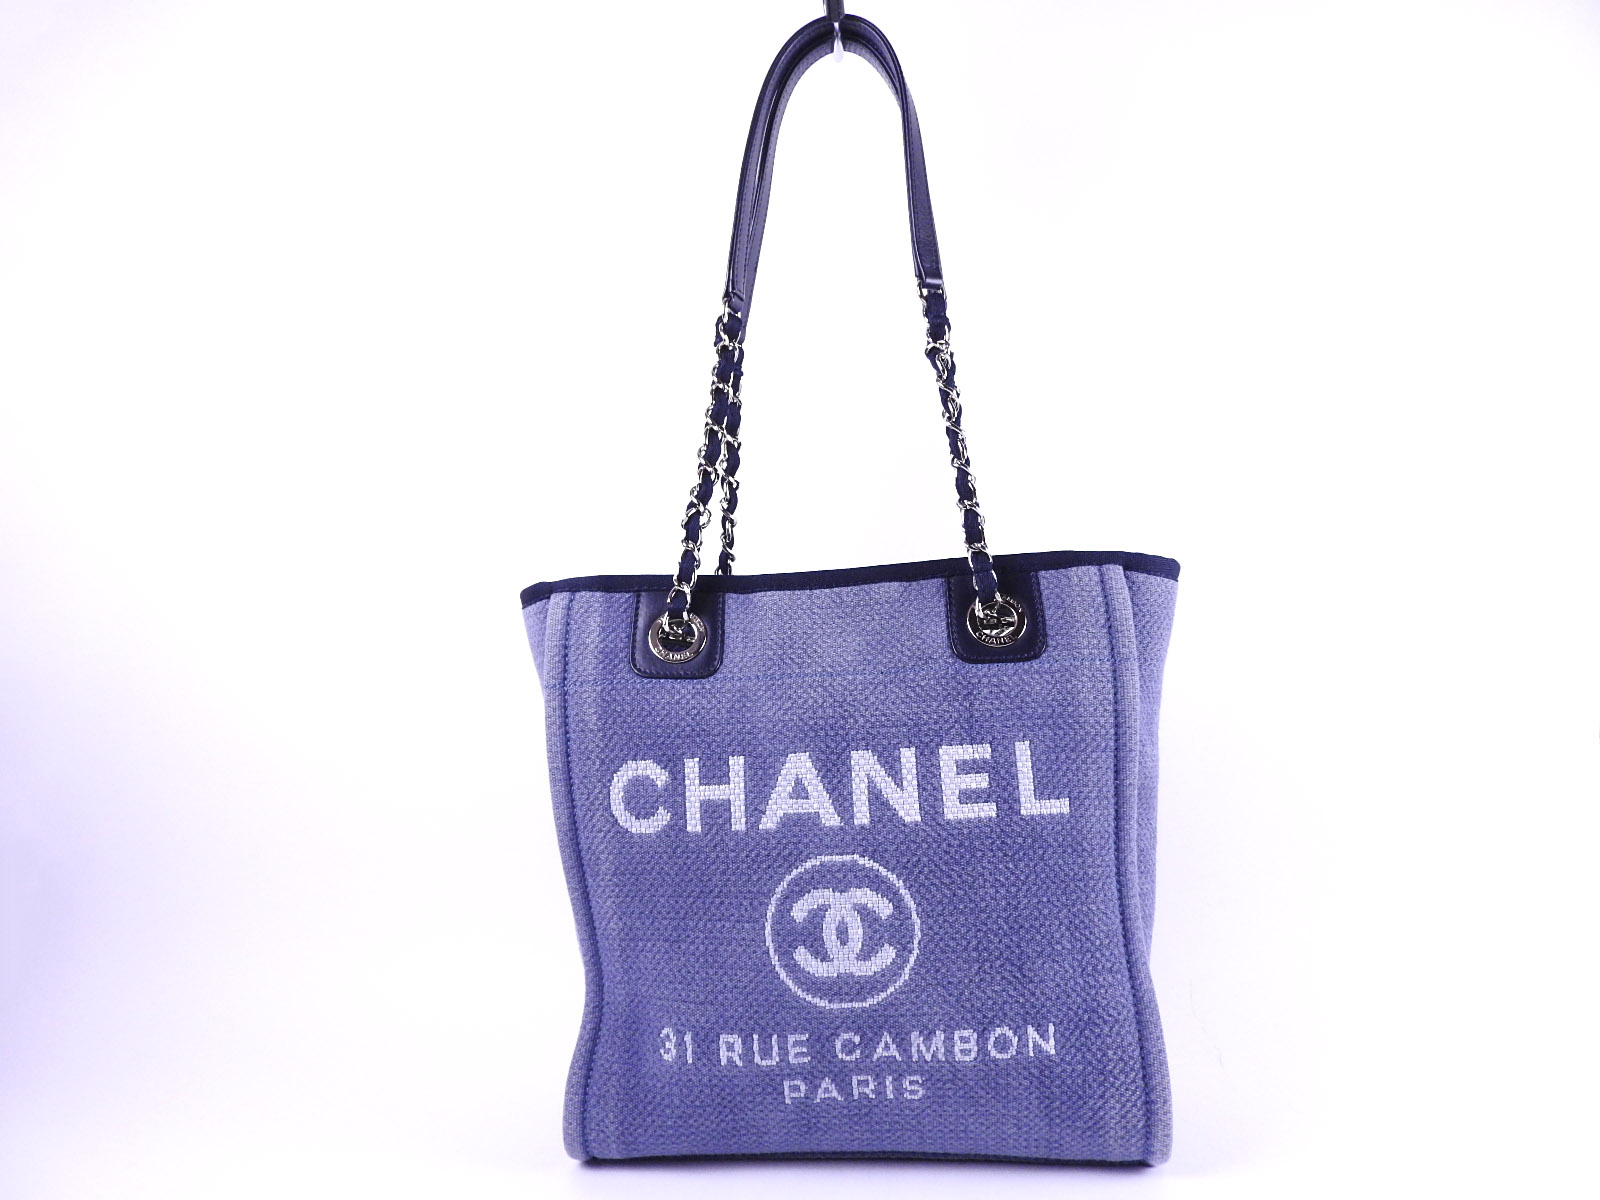 eb41151a0ba9 Auth CHANEL Deauville PM Chain Shoulder Tote Bag Denim Canvas Blue Silver  A66939 A-8449